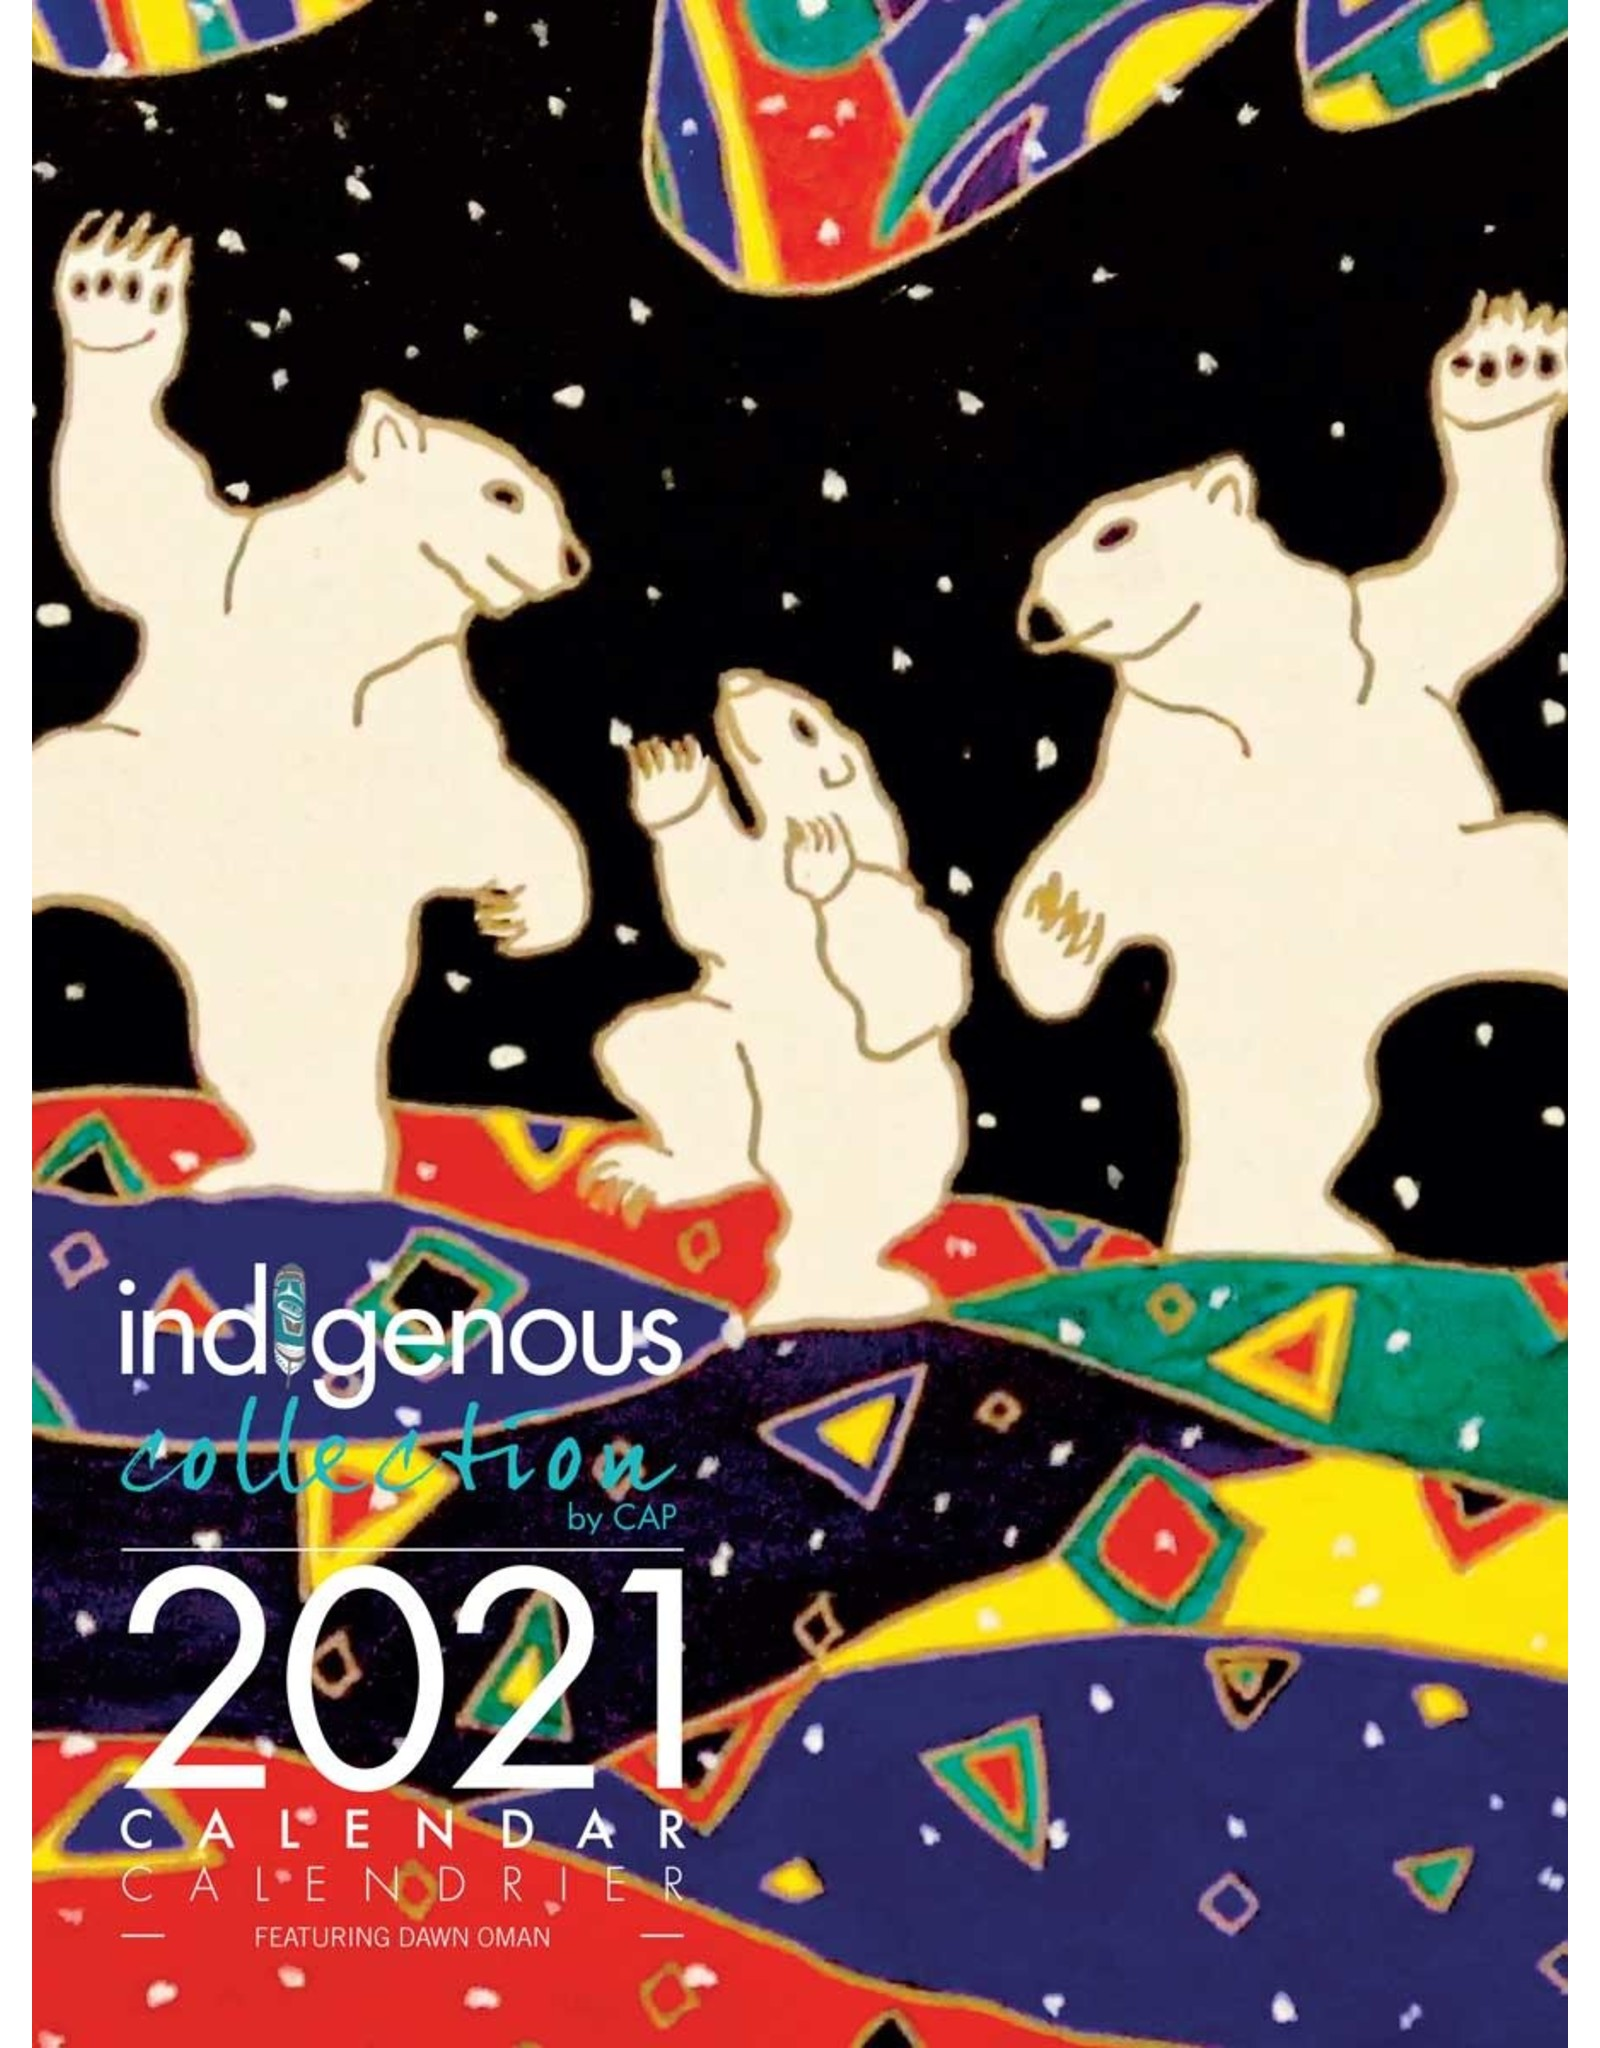 Dawn Oman 2021 Calendar - CAL 110